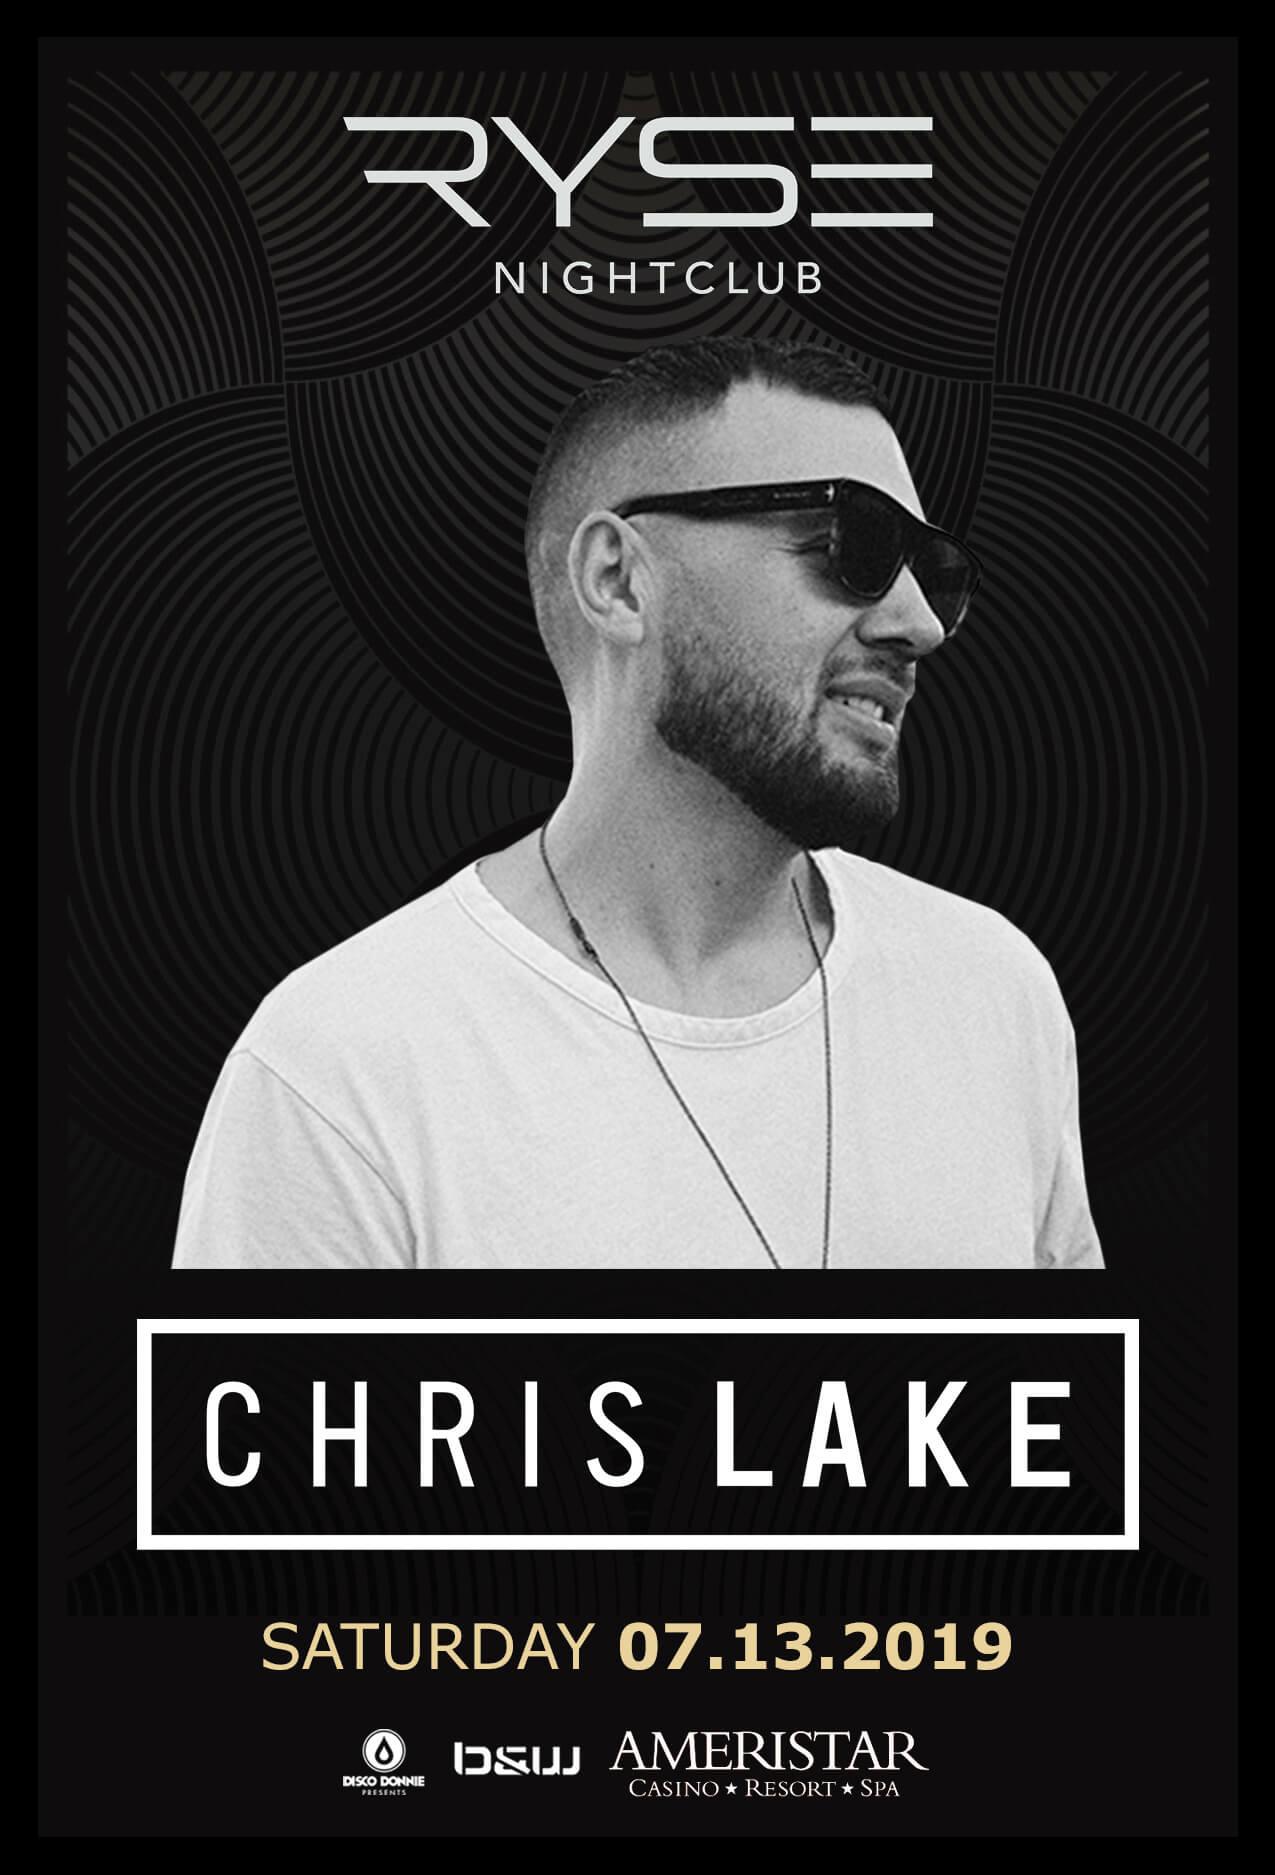 Chris Lake in St Charles